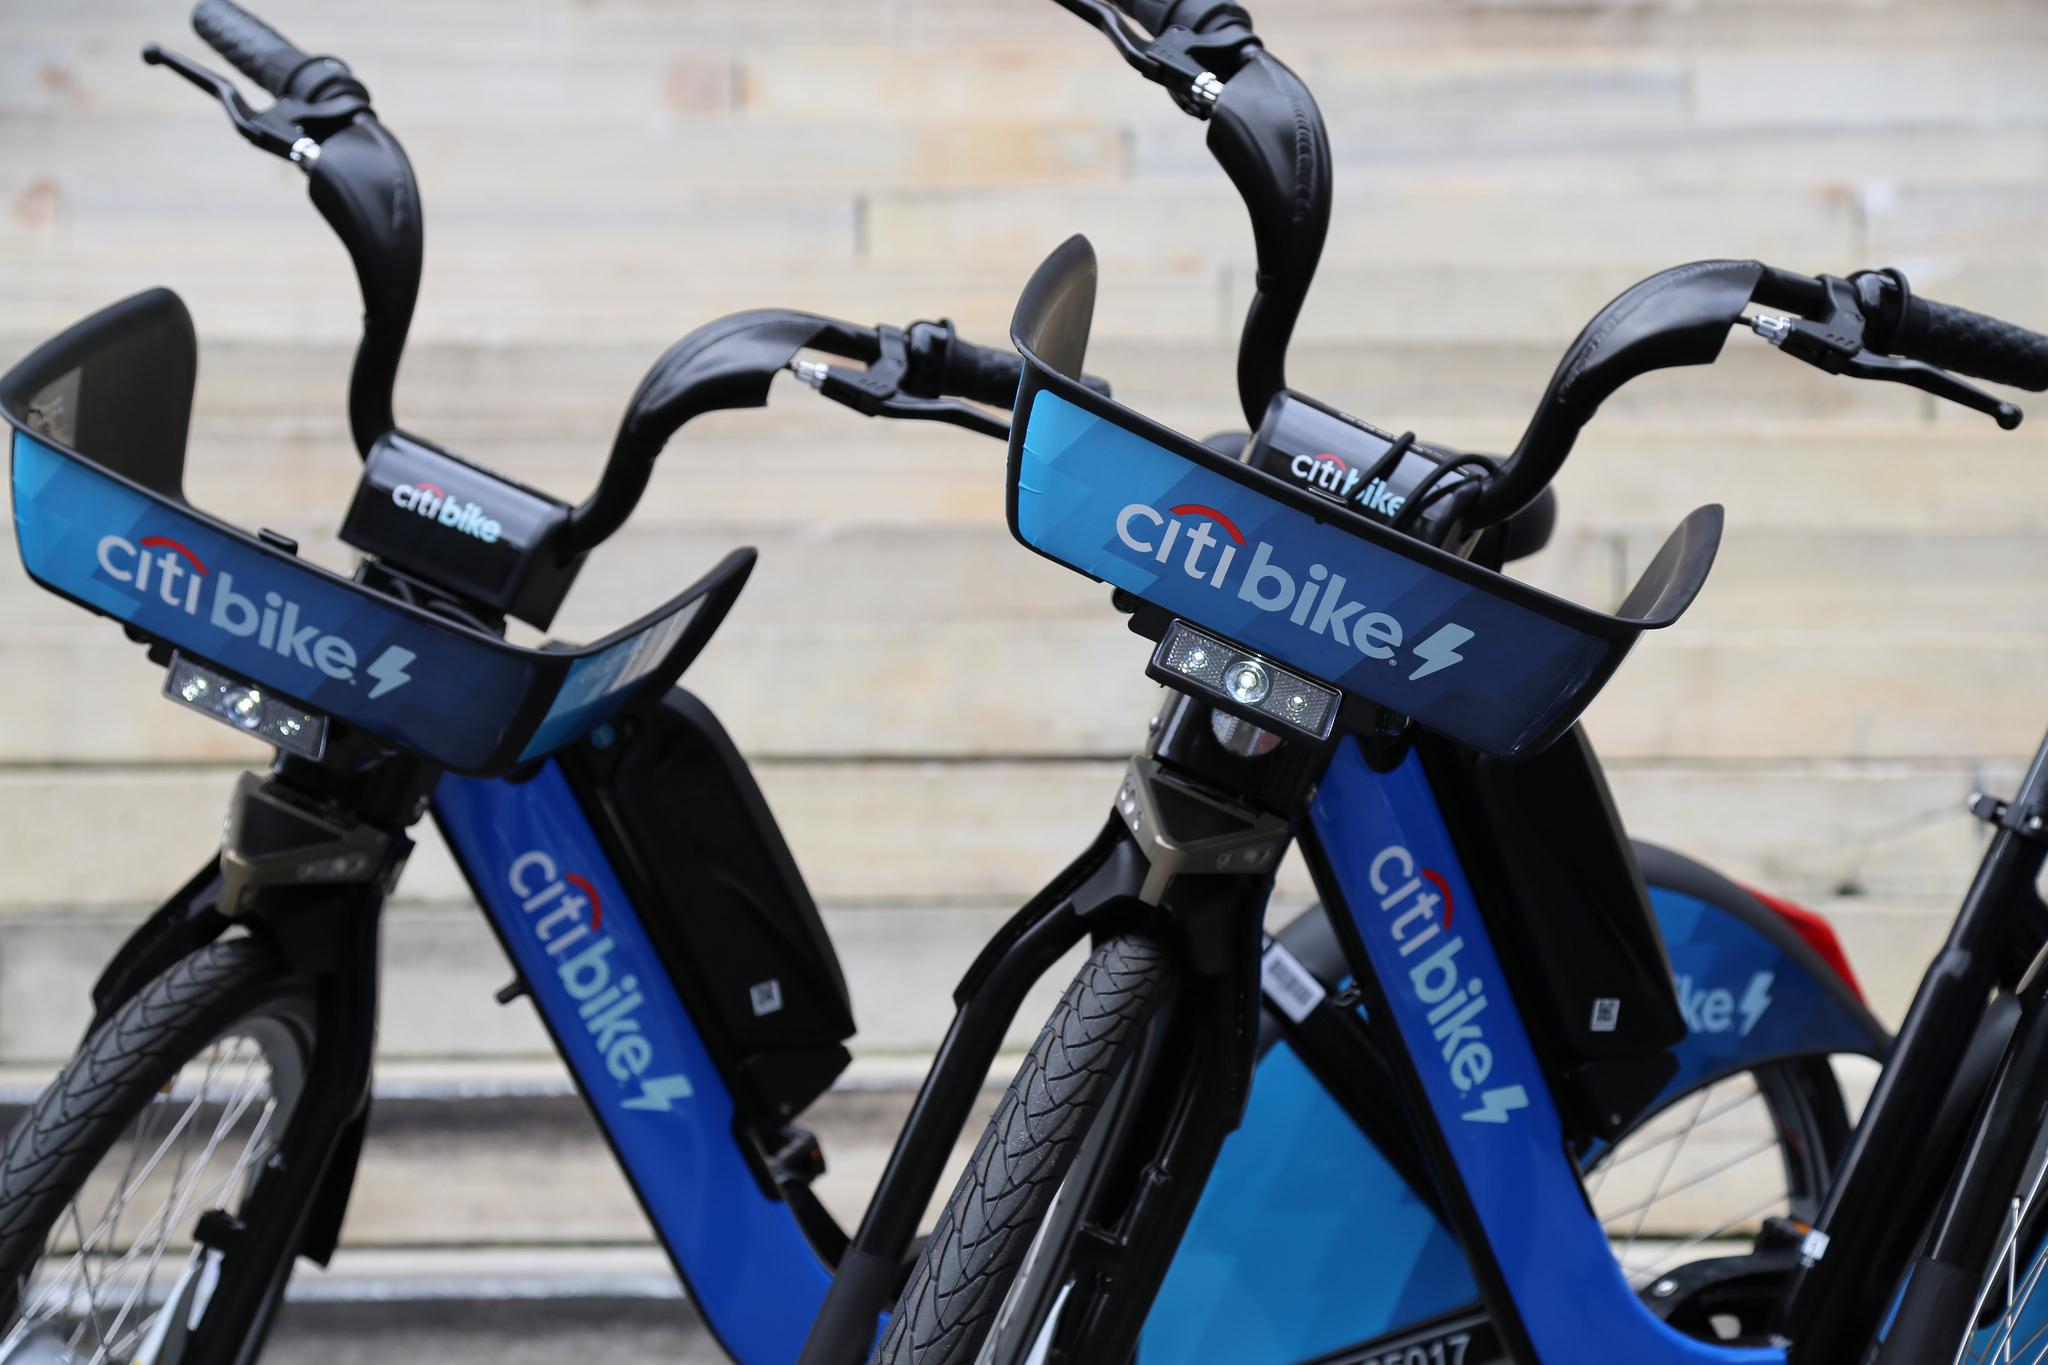 citi bike, e-bikes, nyc bike share